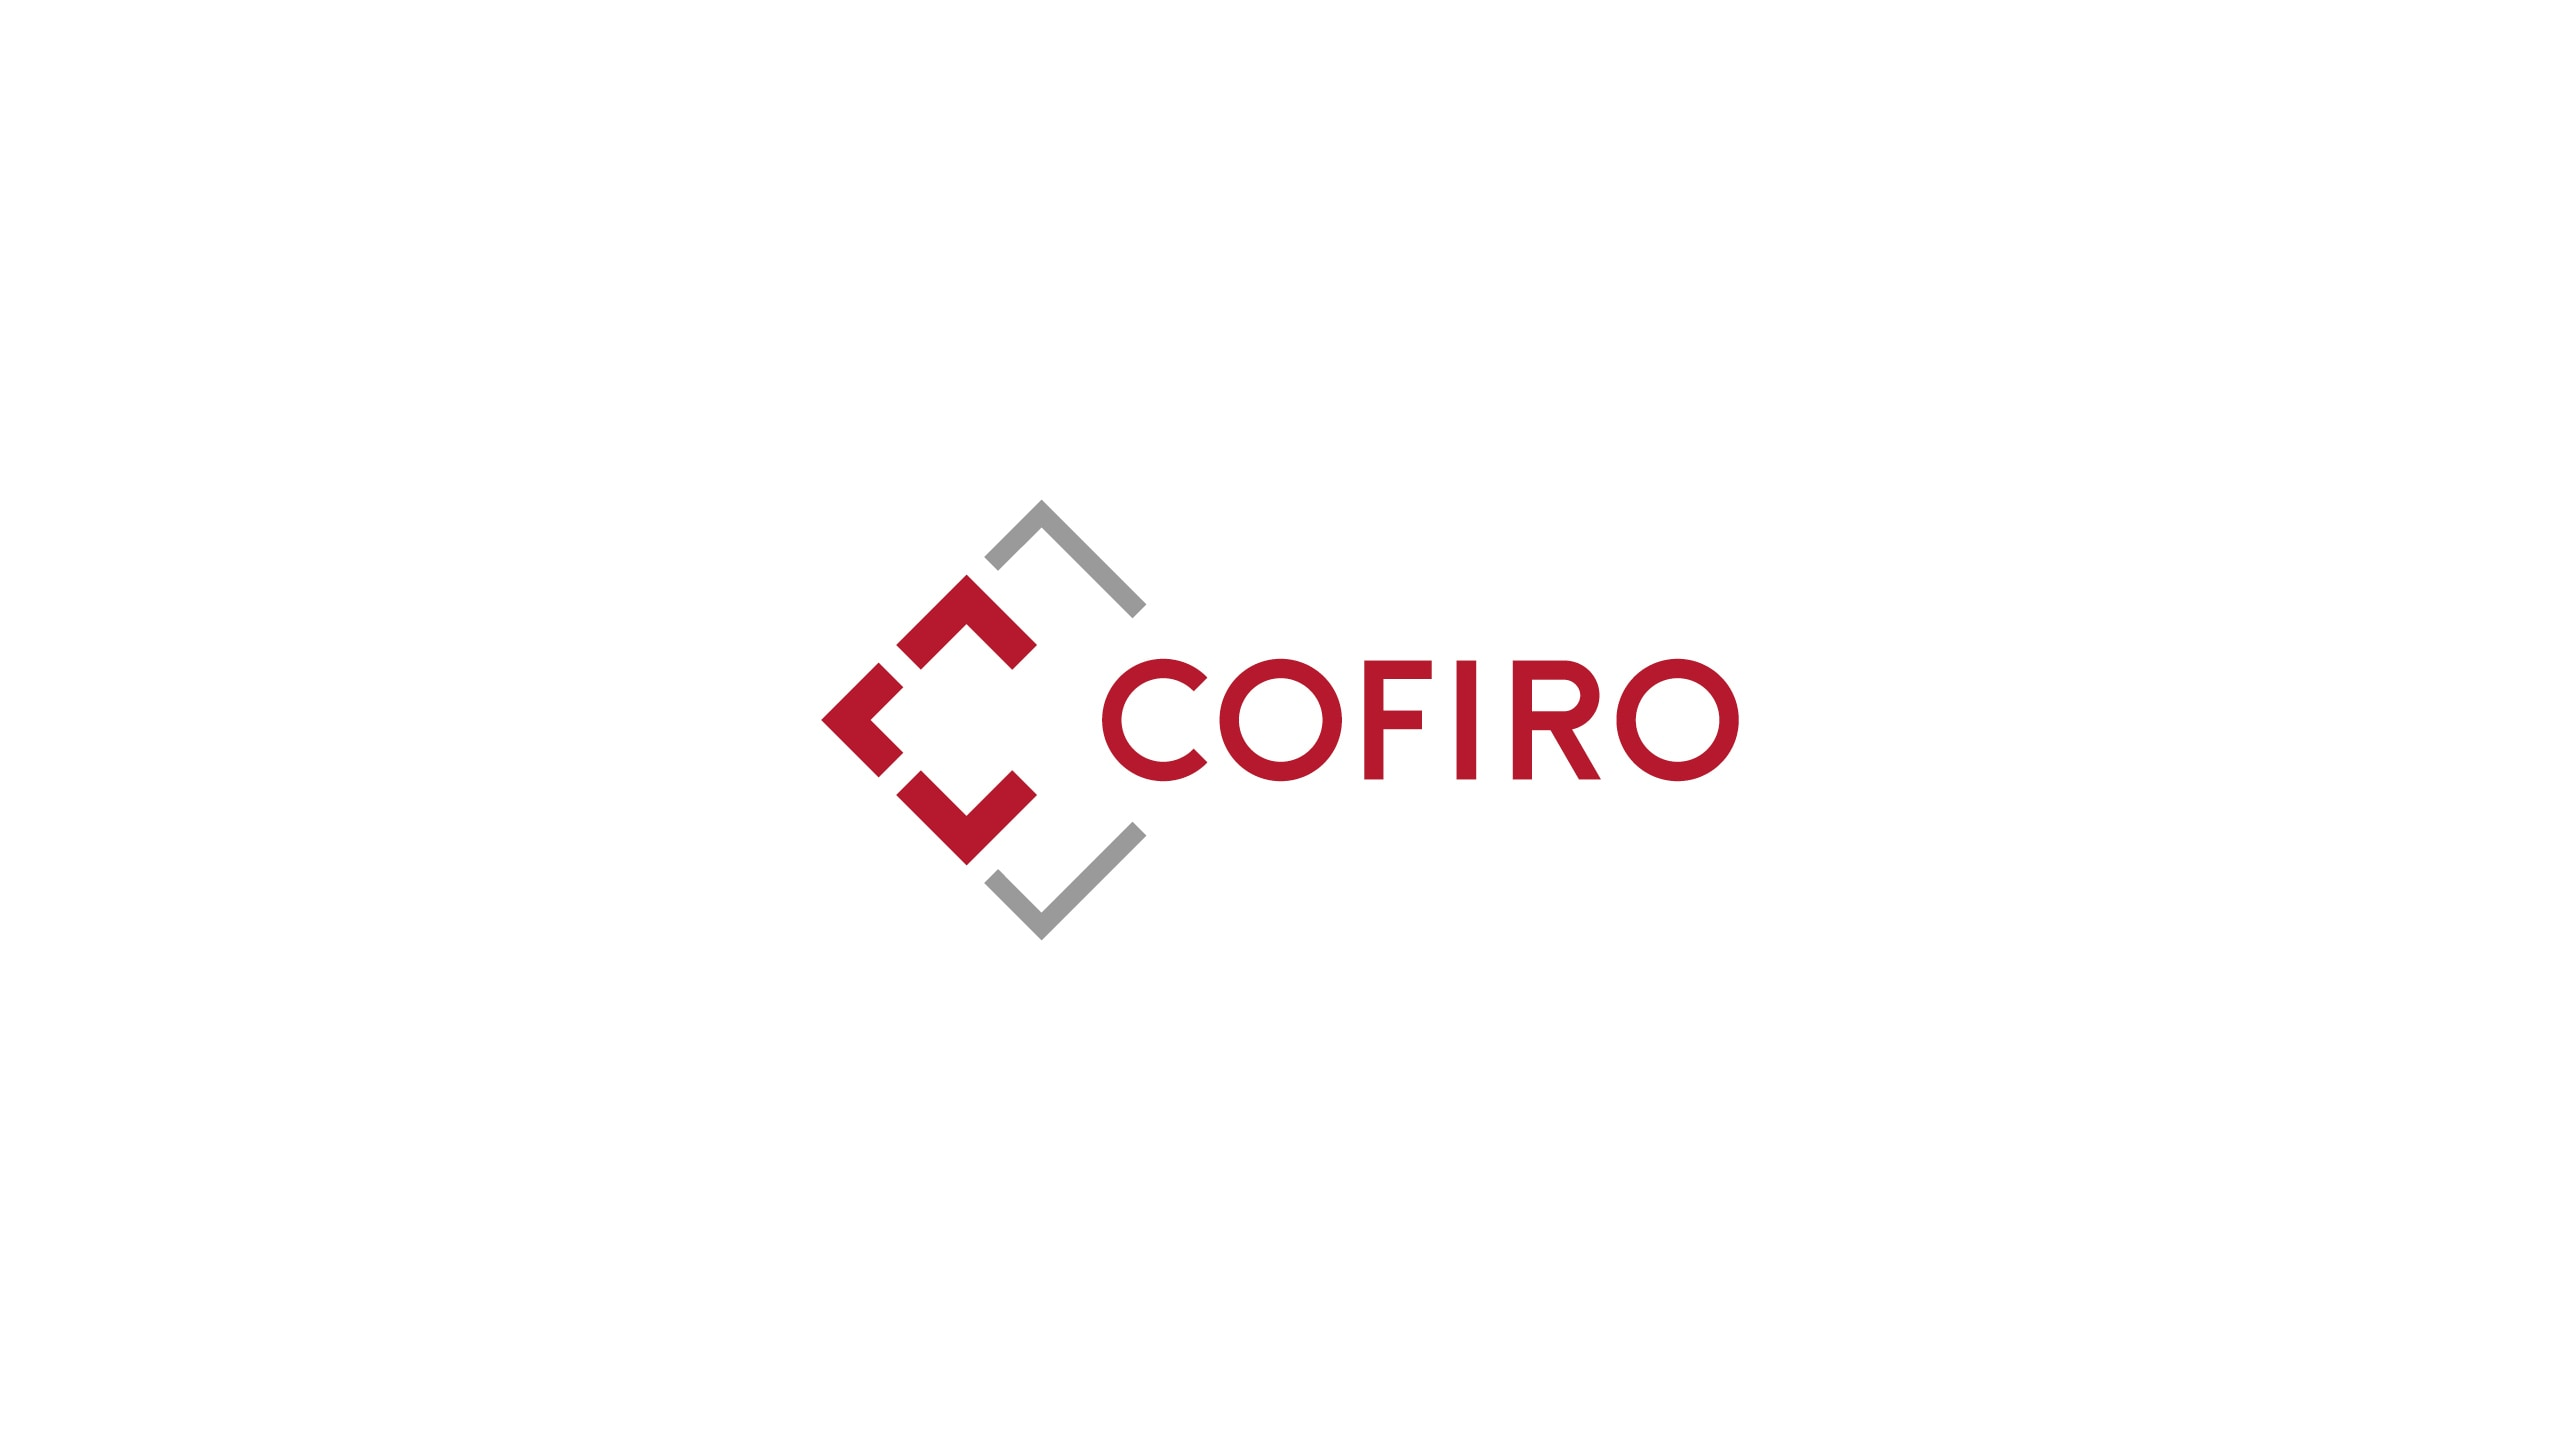 Cofiro_1